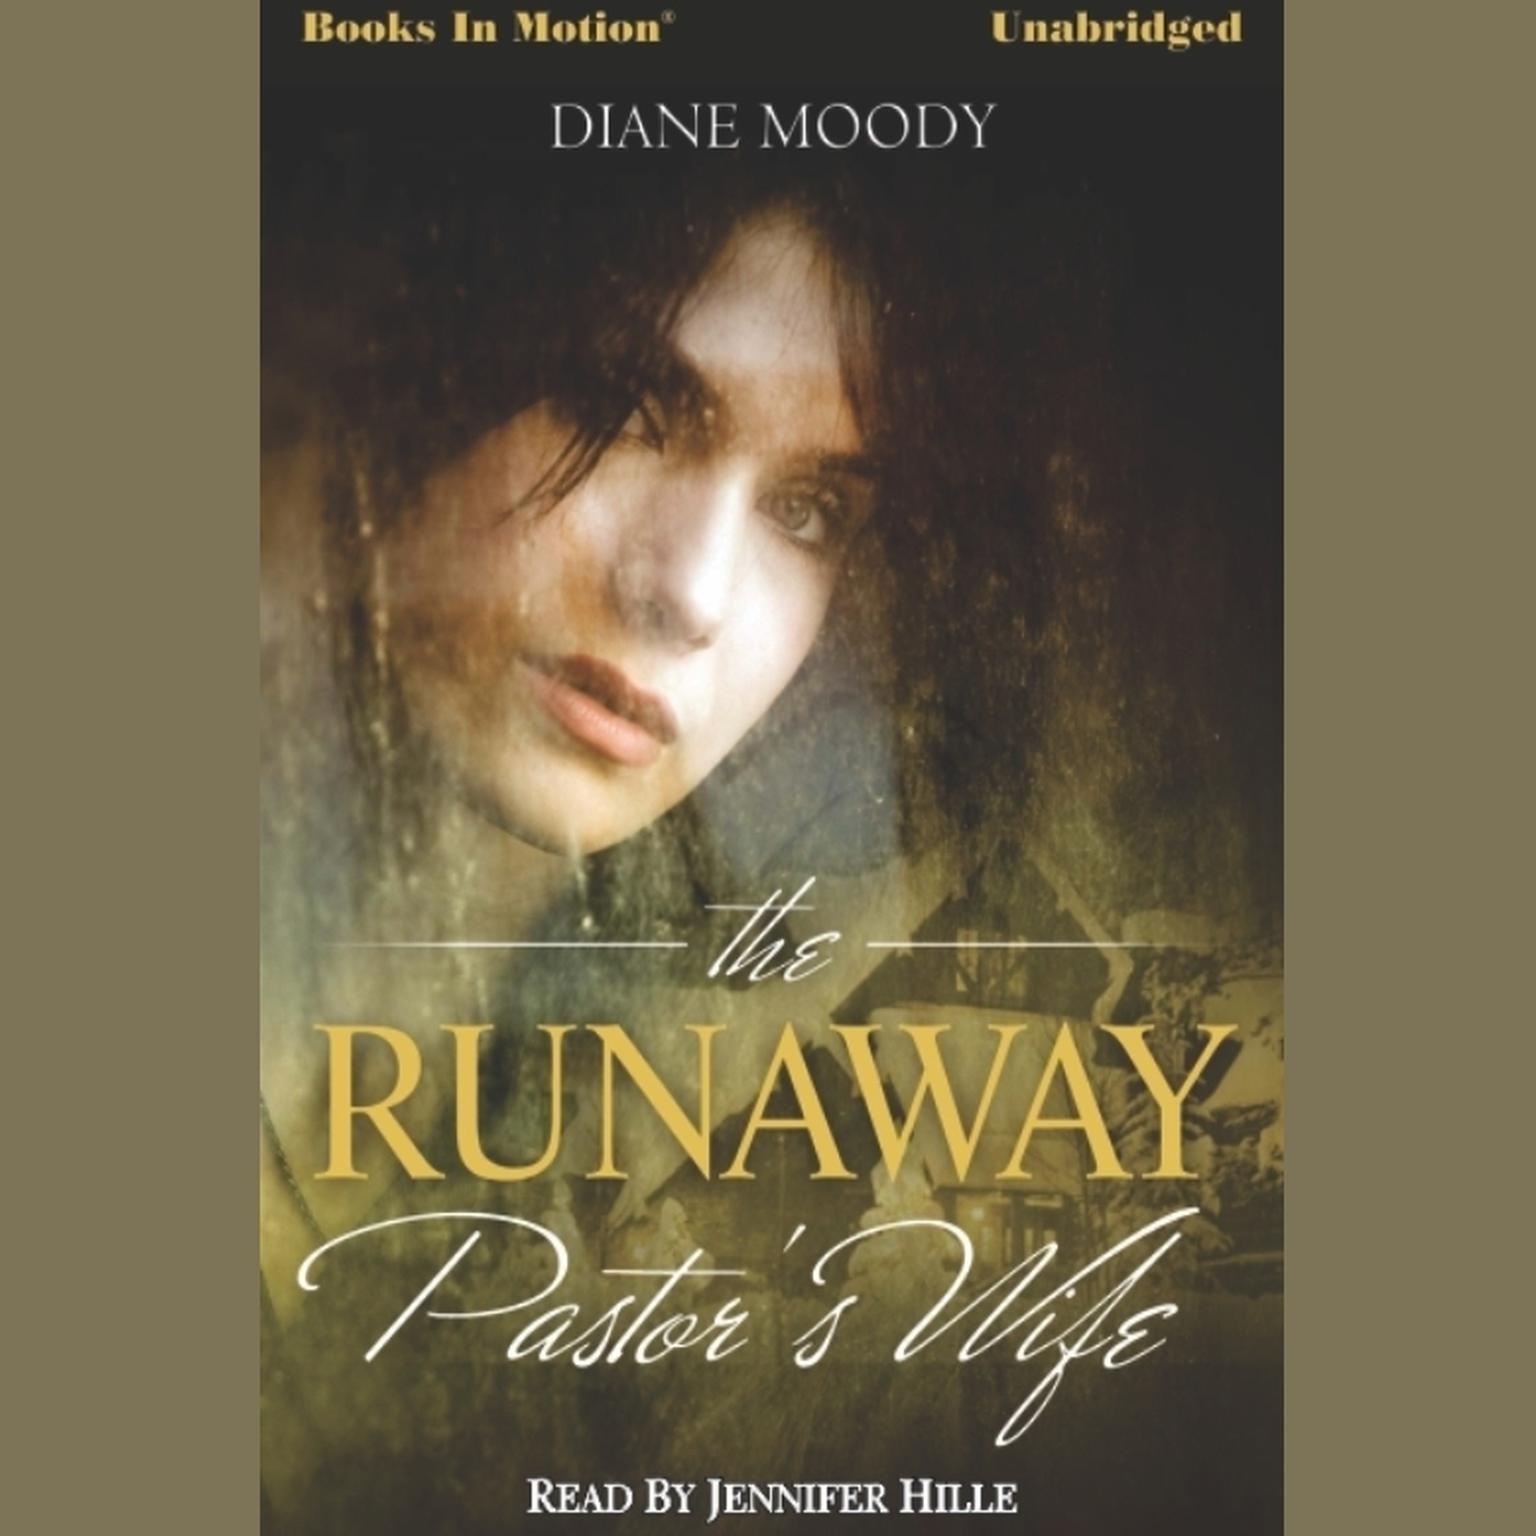 The Runaway Pastors Wife Audiobook, by Diane Moody